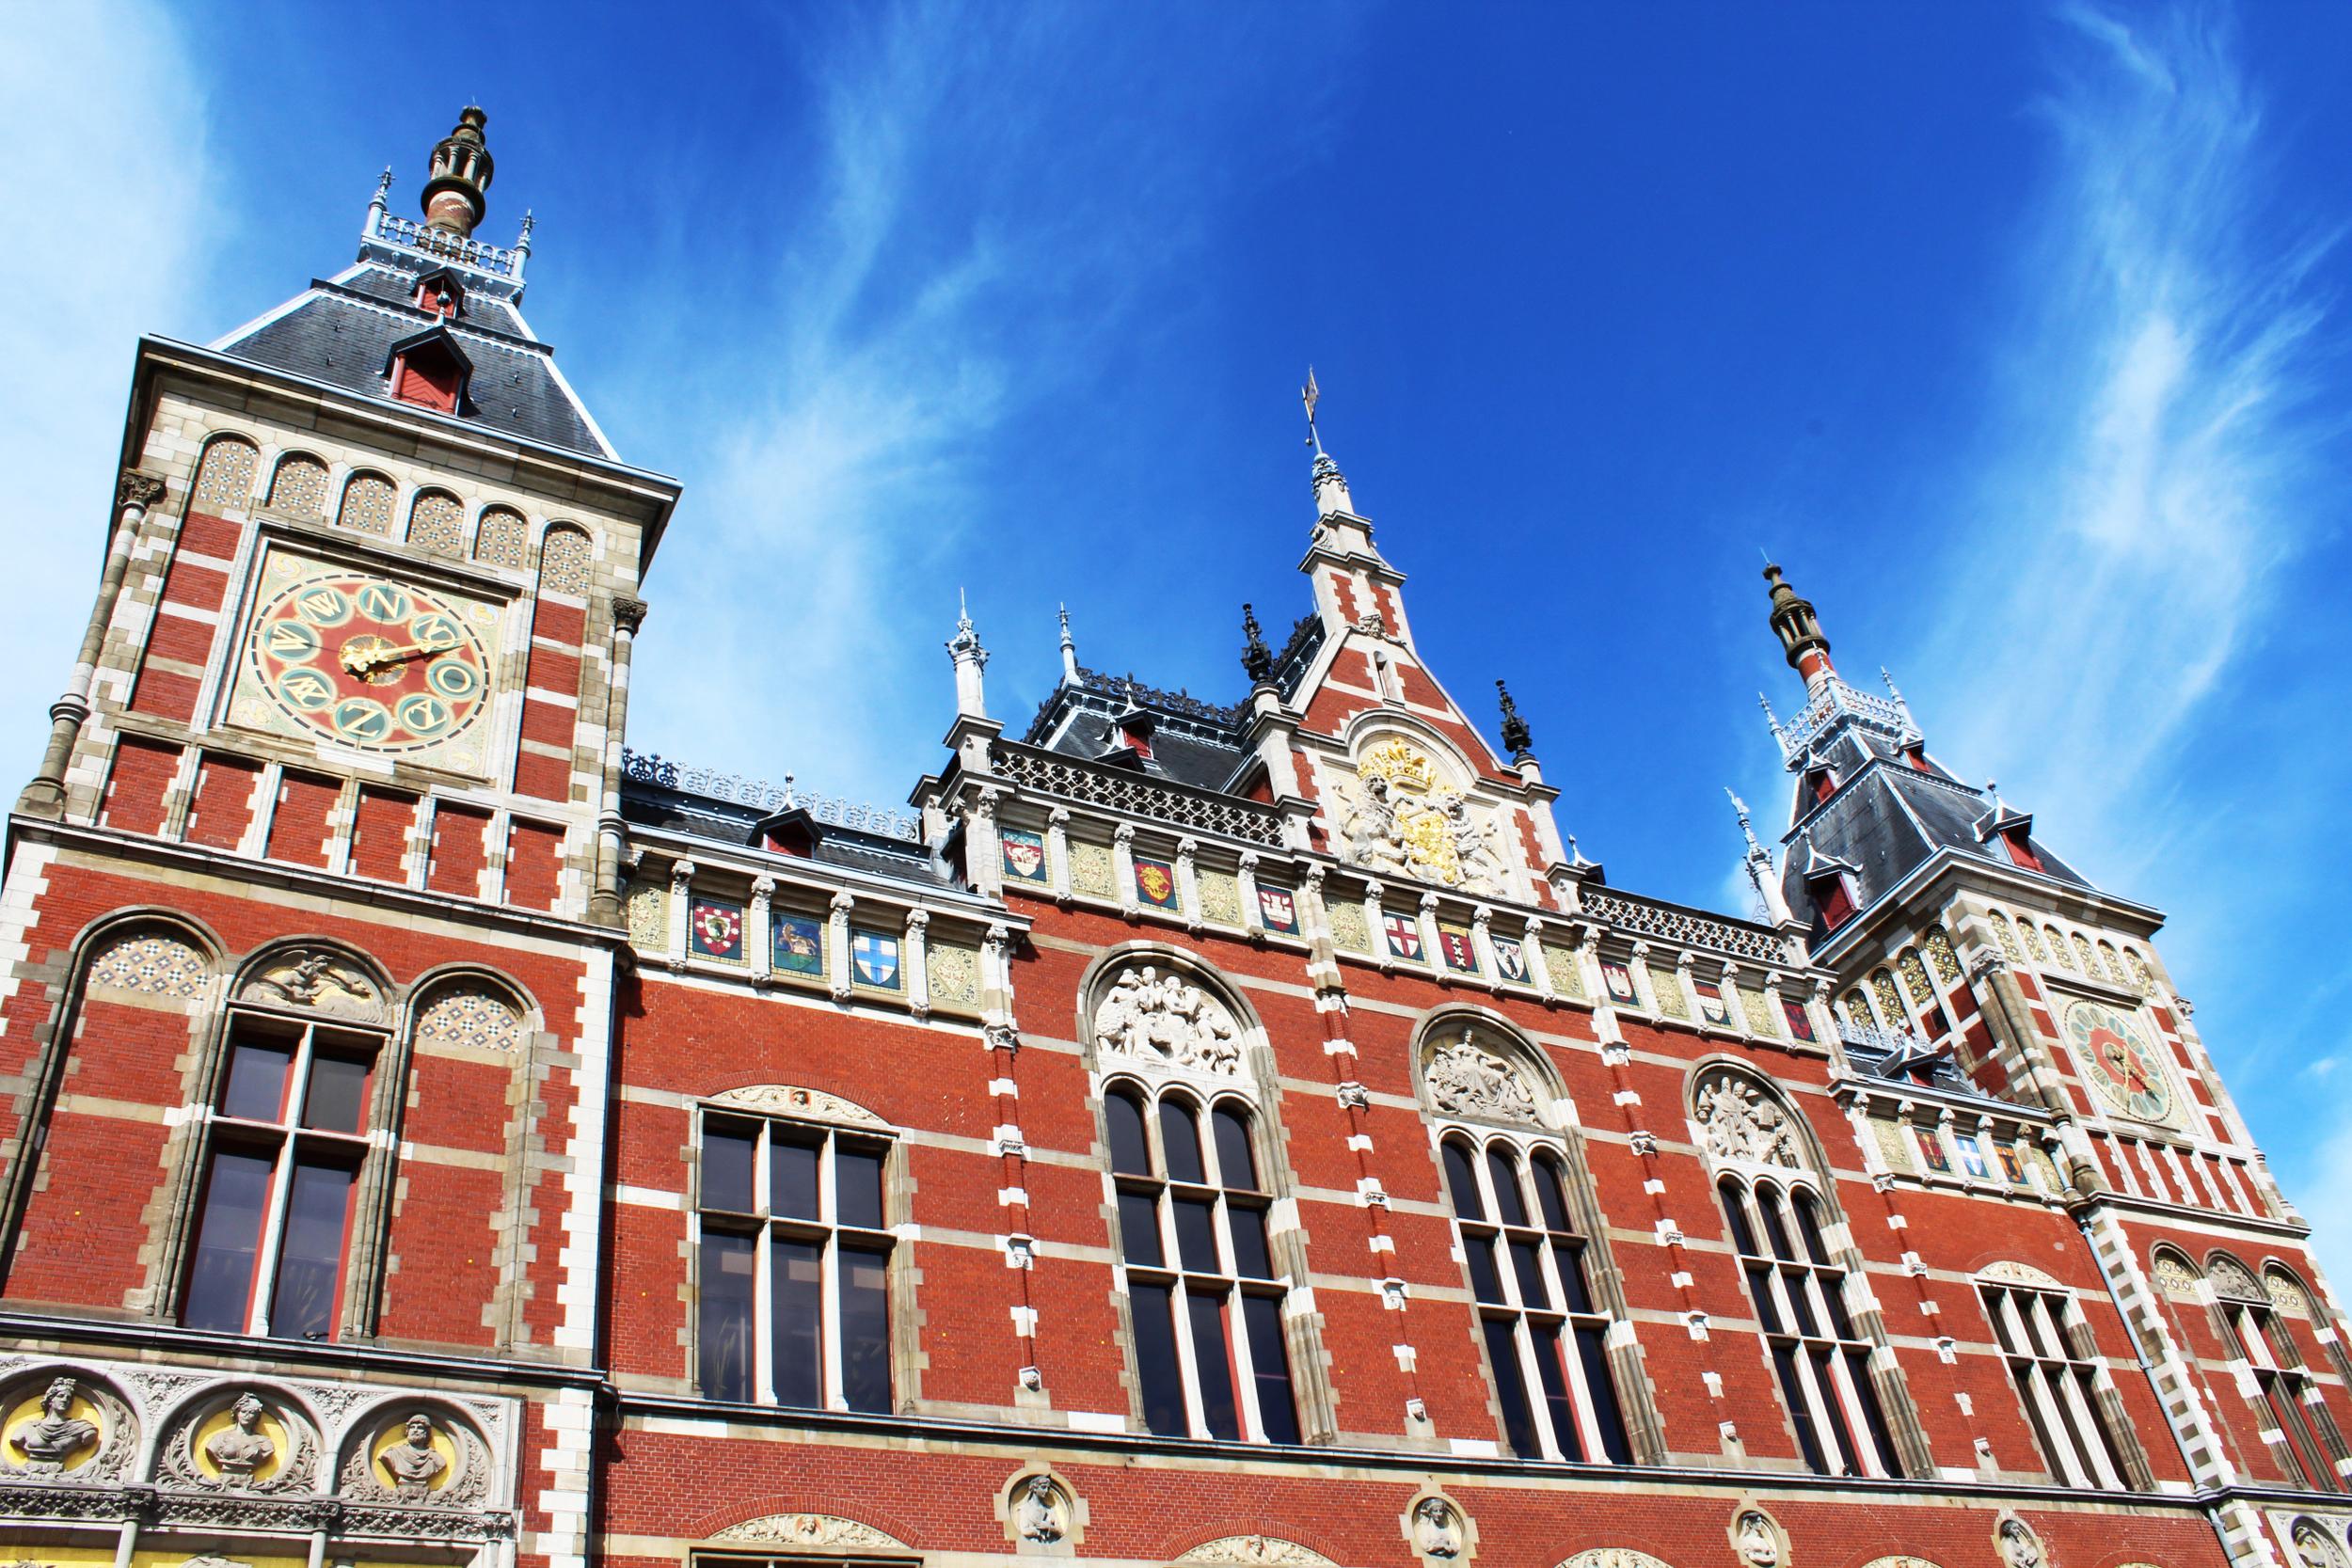 Train Station in Amsterdam - Photograph by Lauren Martin